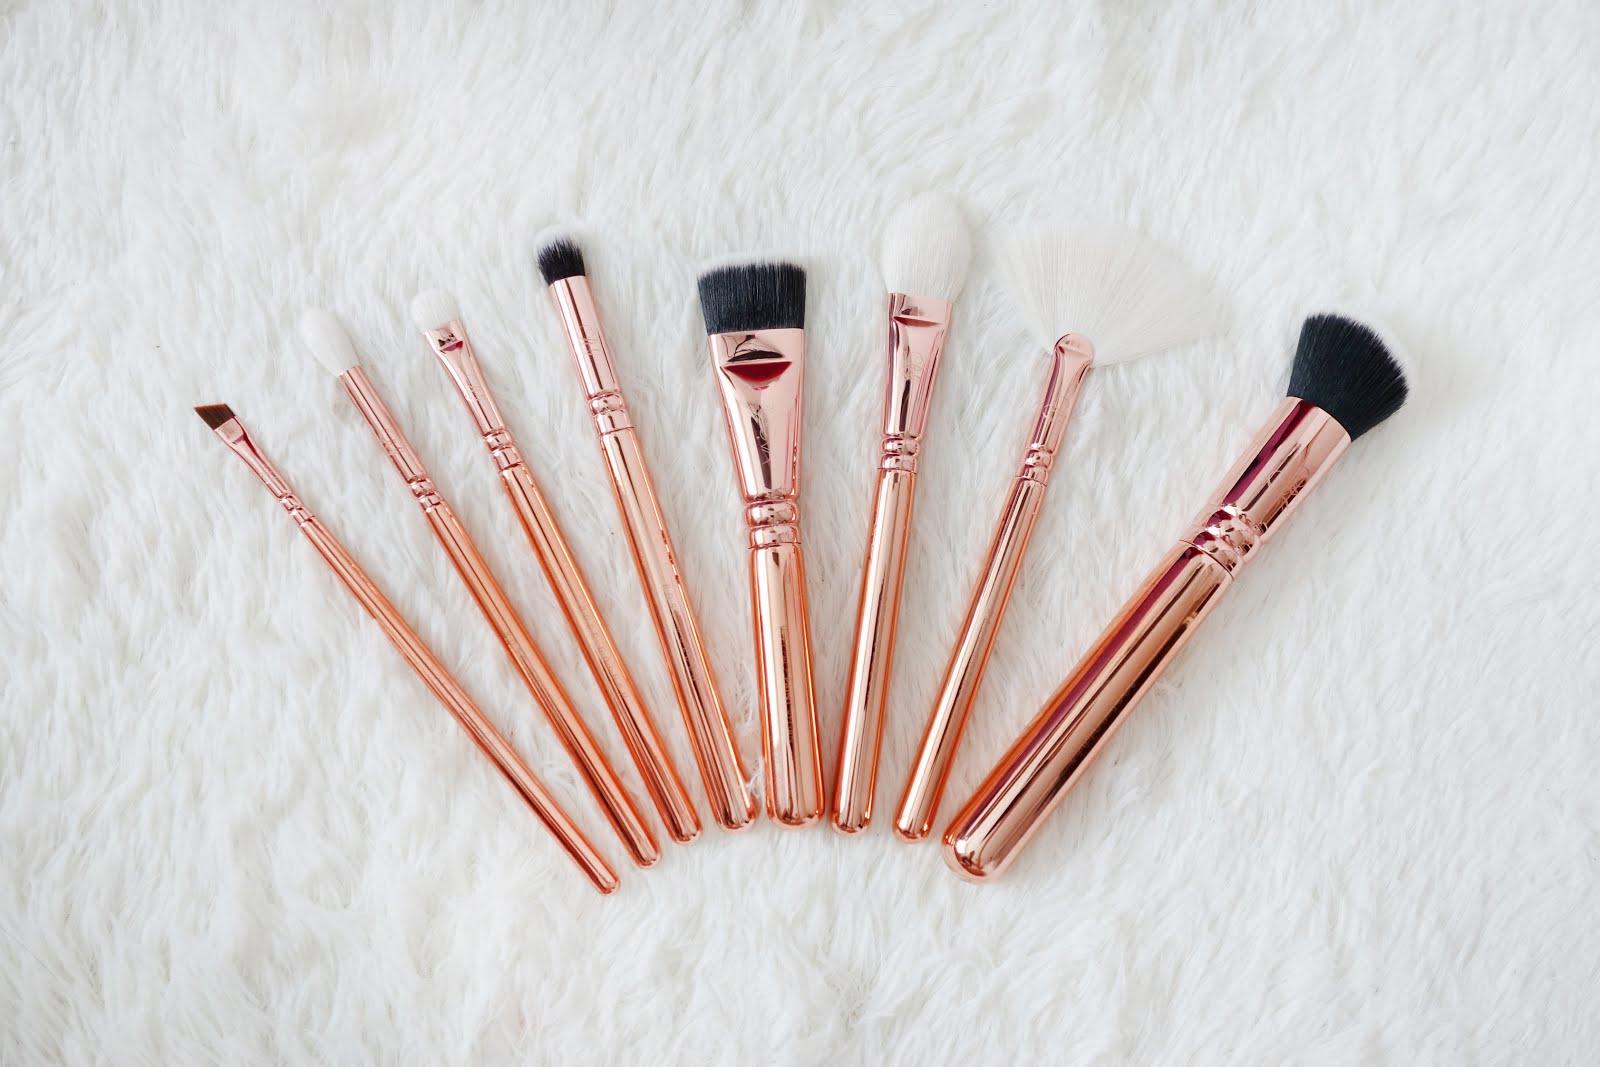 Zoeva Rose Golden Vol 3 Luxury Brush Set Blush Dark Brown 8 Piece Bursh Bag 317 Wing Liner 228 Luxe Crease 234 Smoky Shader 142 Concealer Buffer